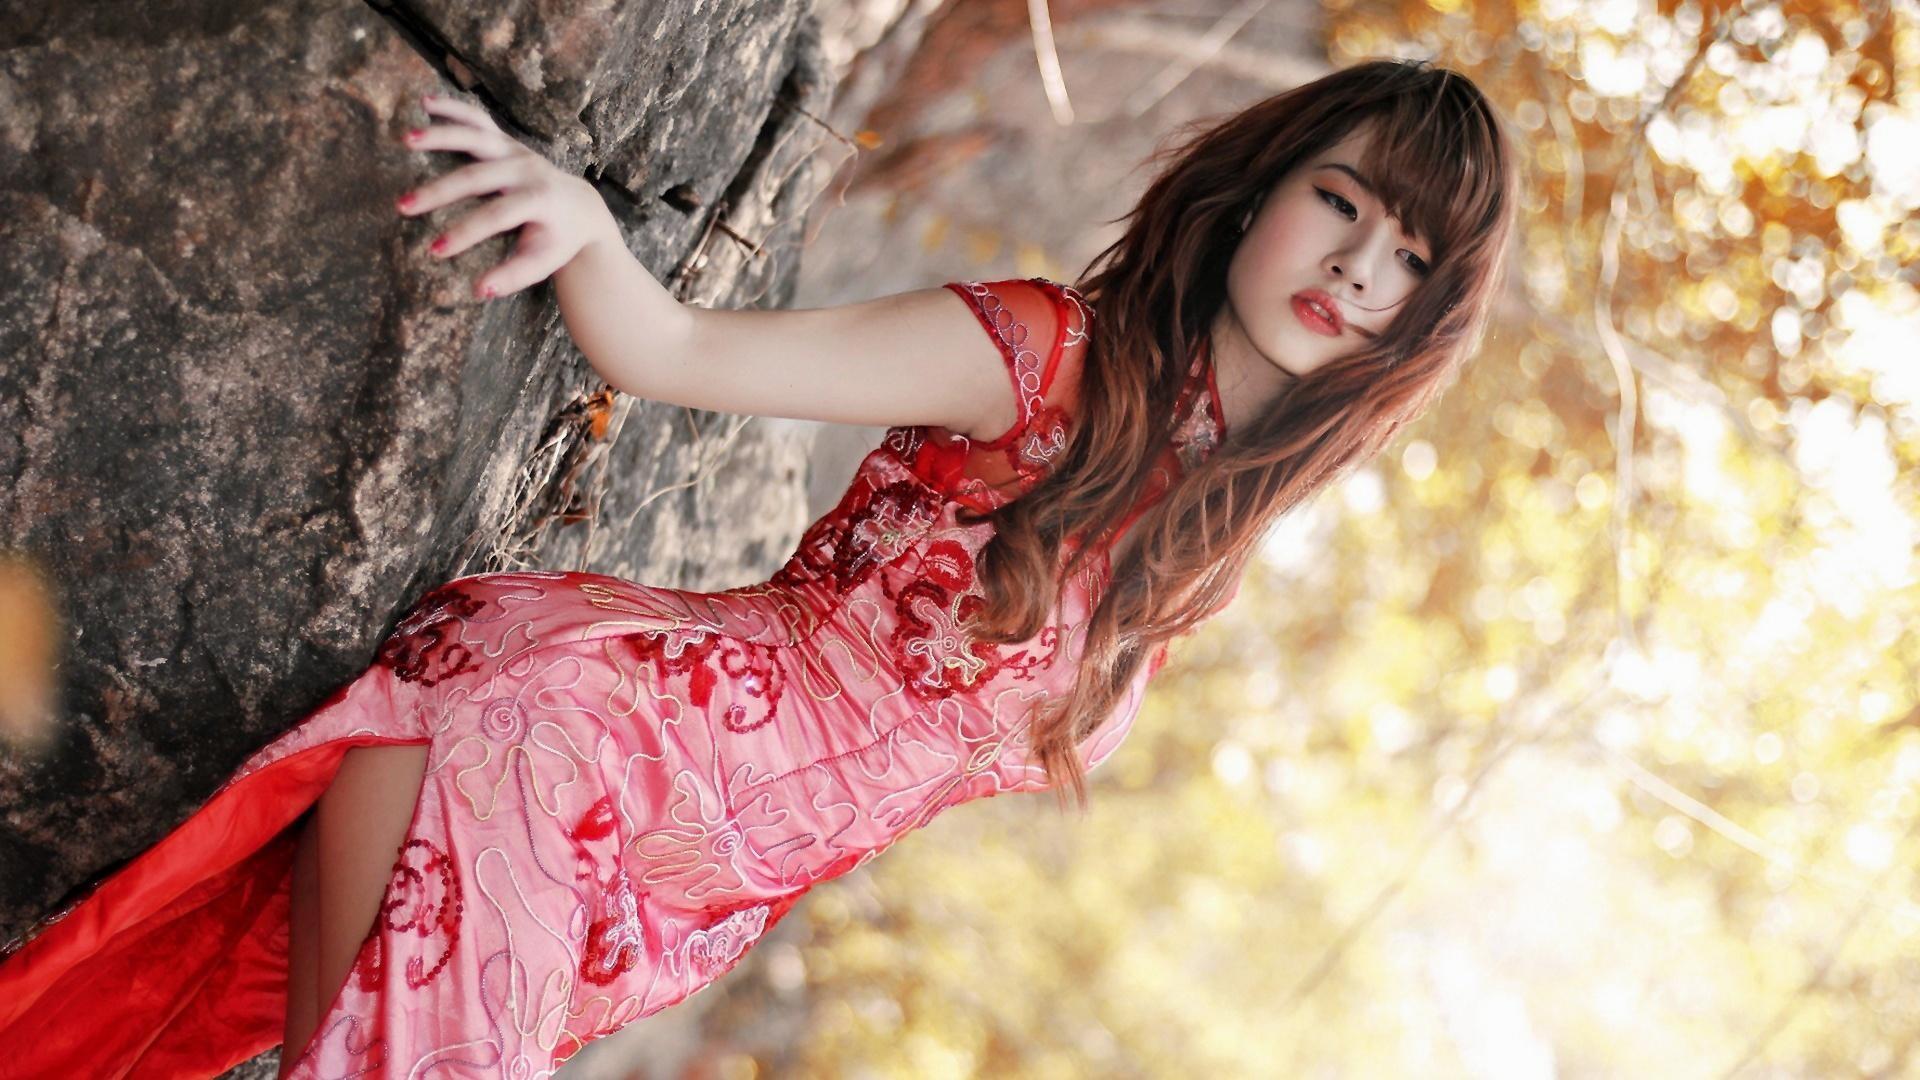 wallpaper.wiki-HD-Cute-Asian-Photos-PIC-WPE005241